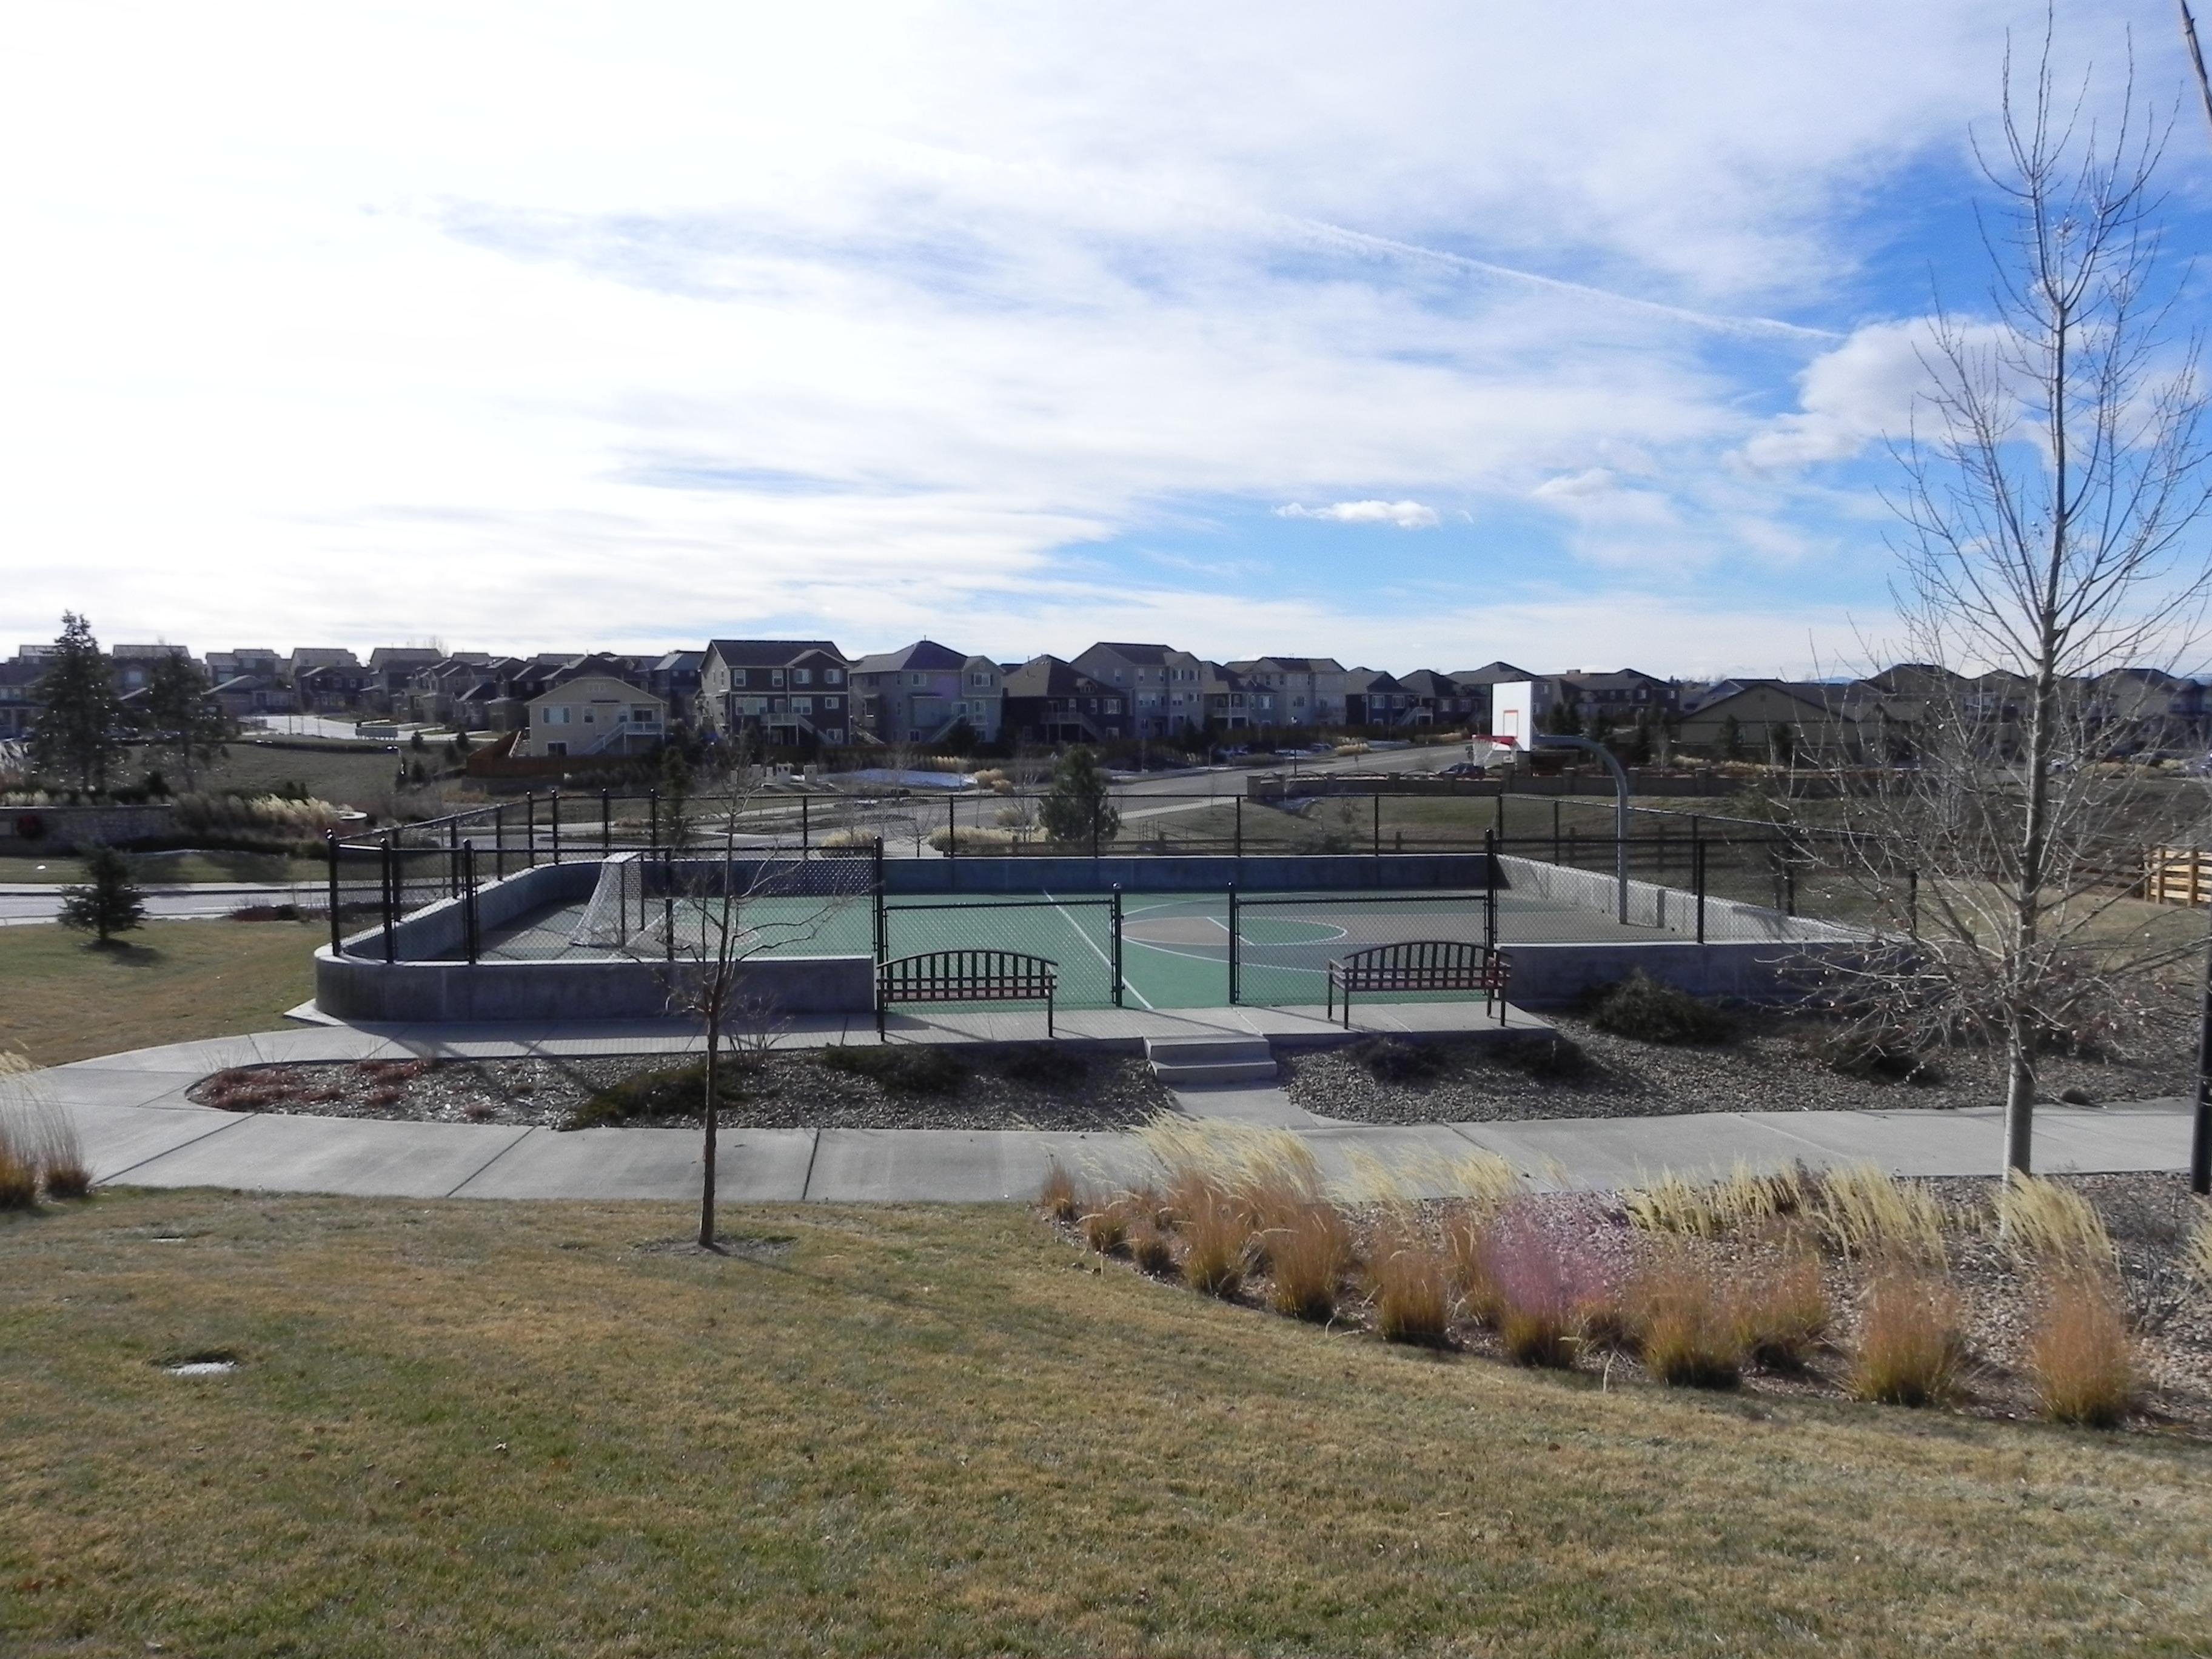 Copperleaf basketball court